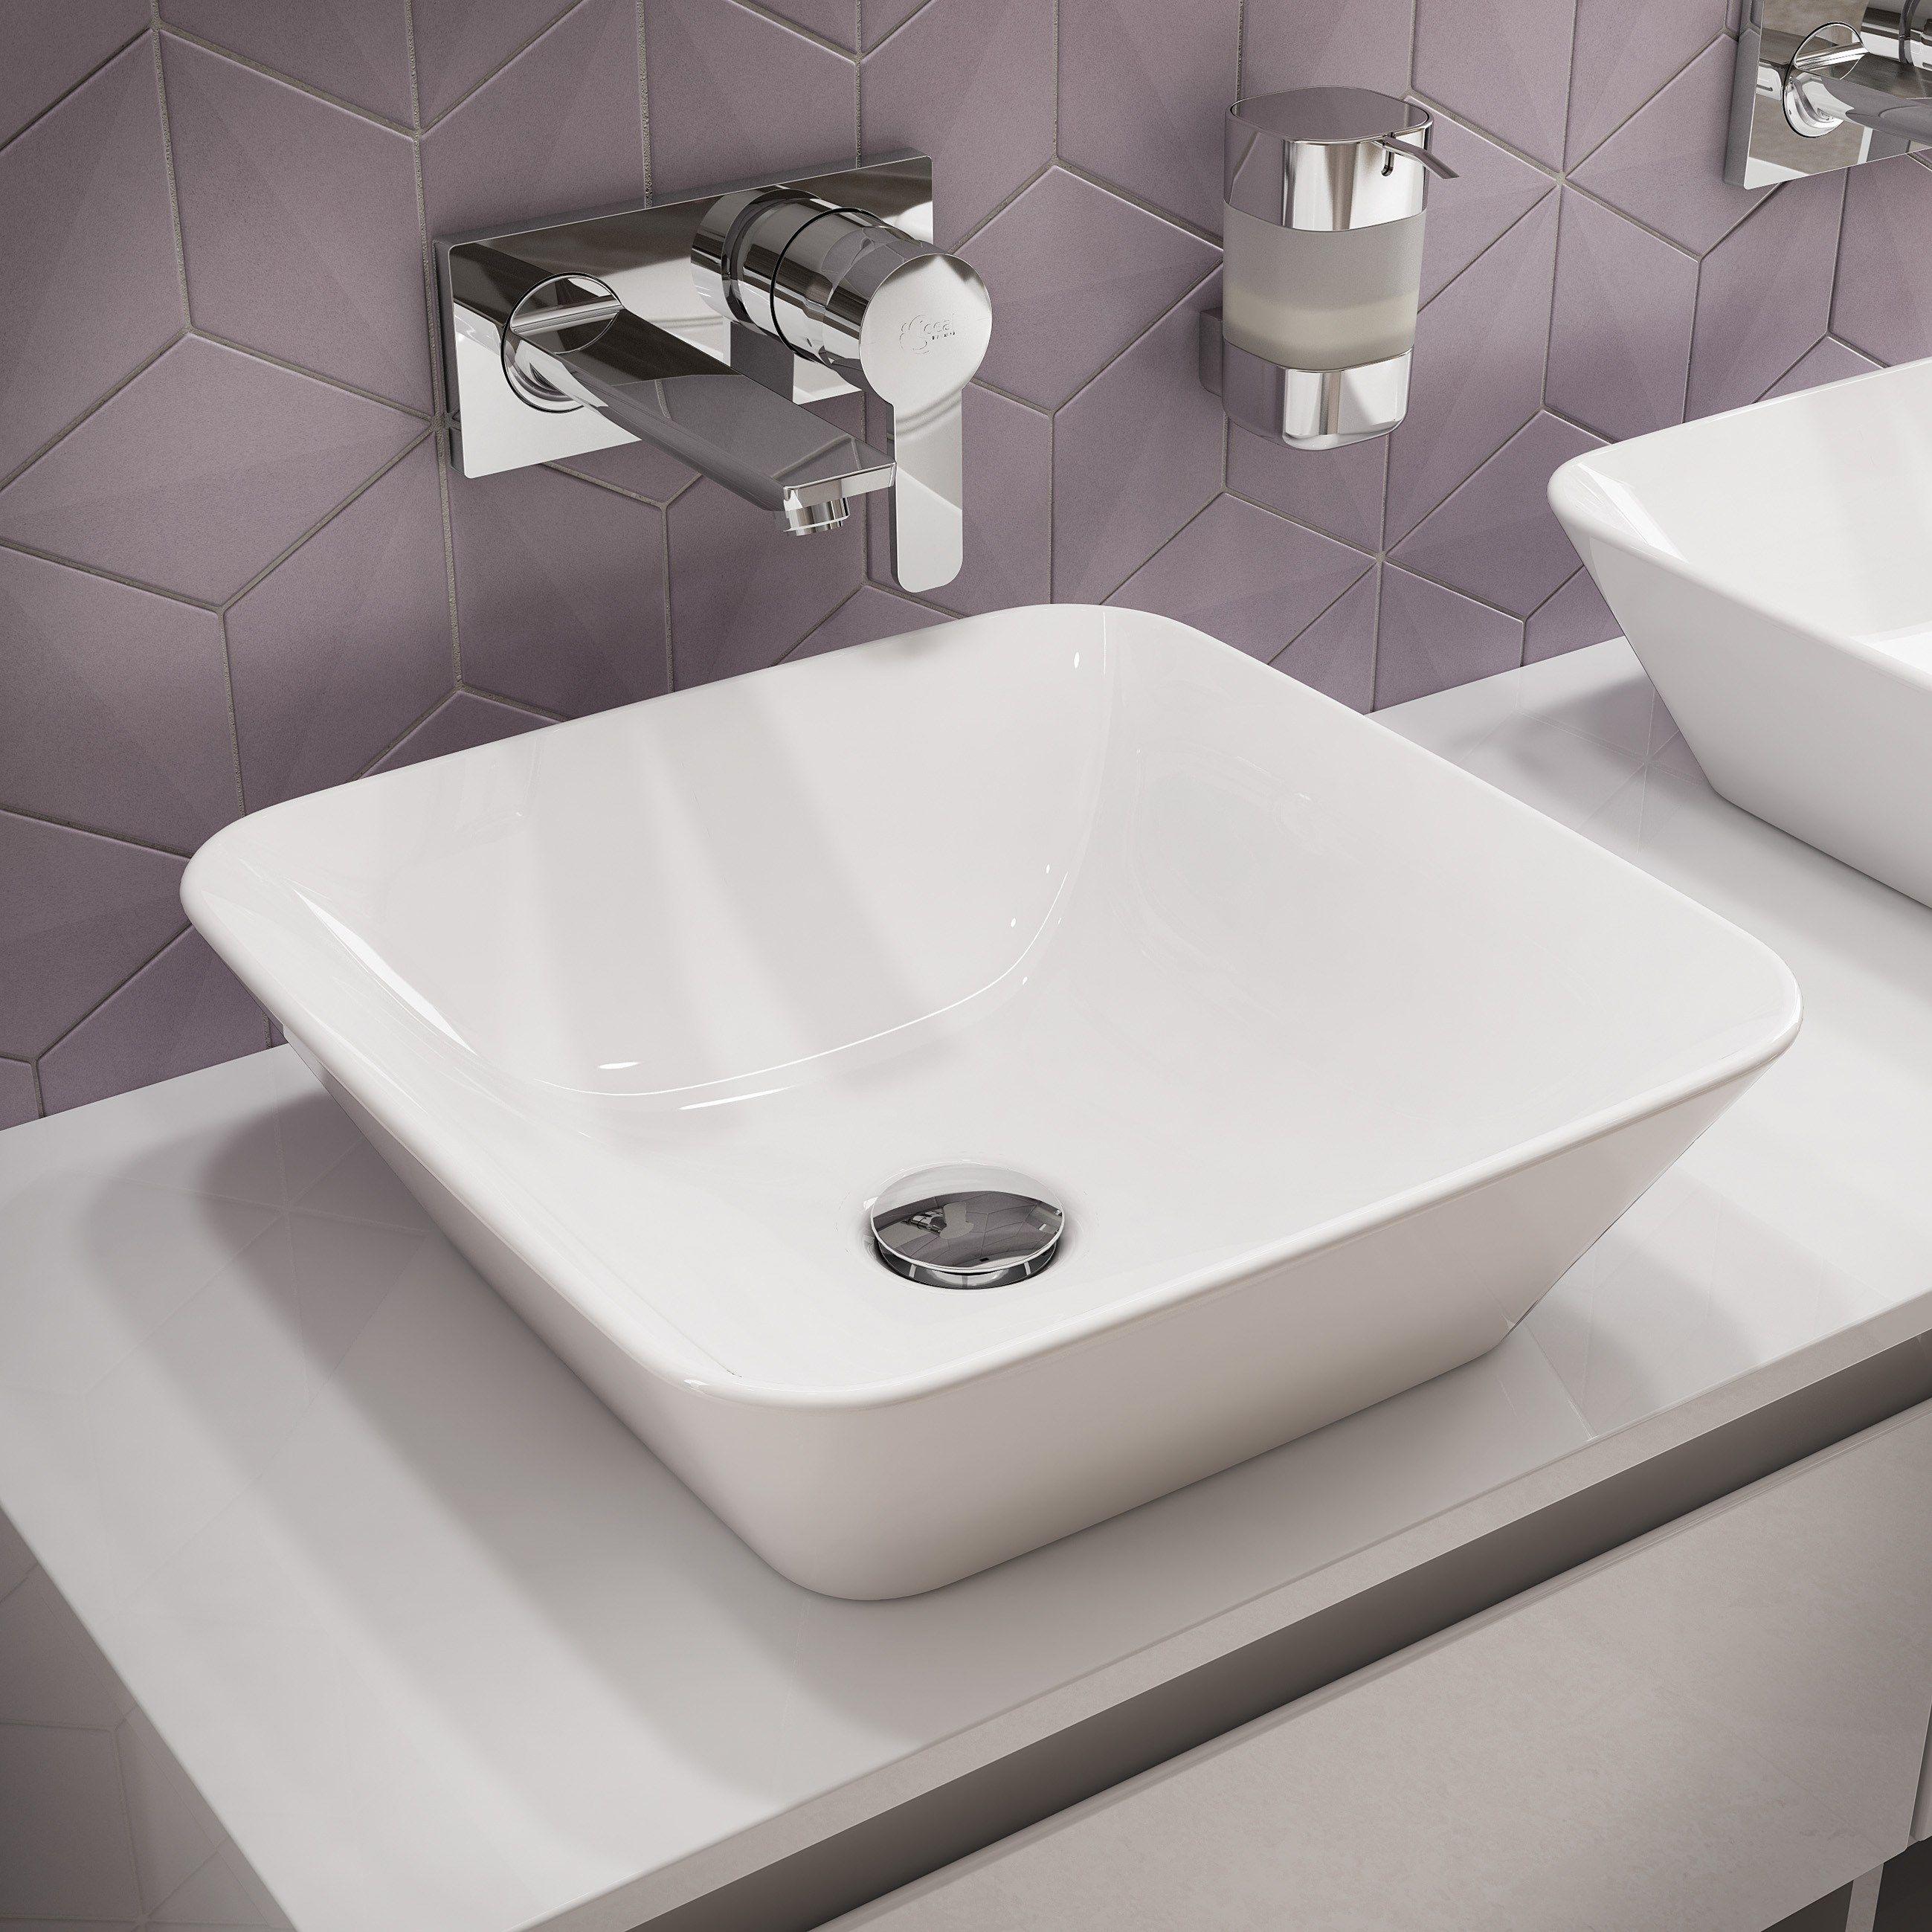 Connect air arredo bagno completo by ideal standard design robin levien - Rubinetti bagno ideal standard ...